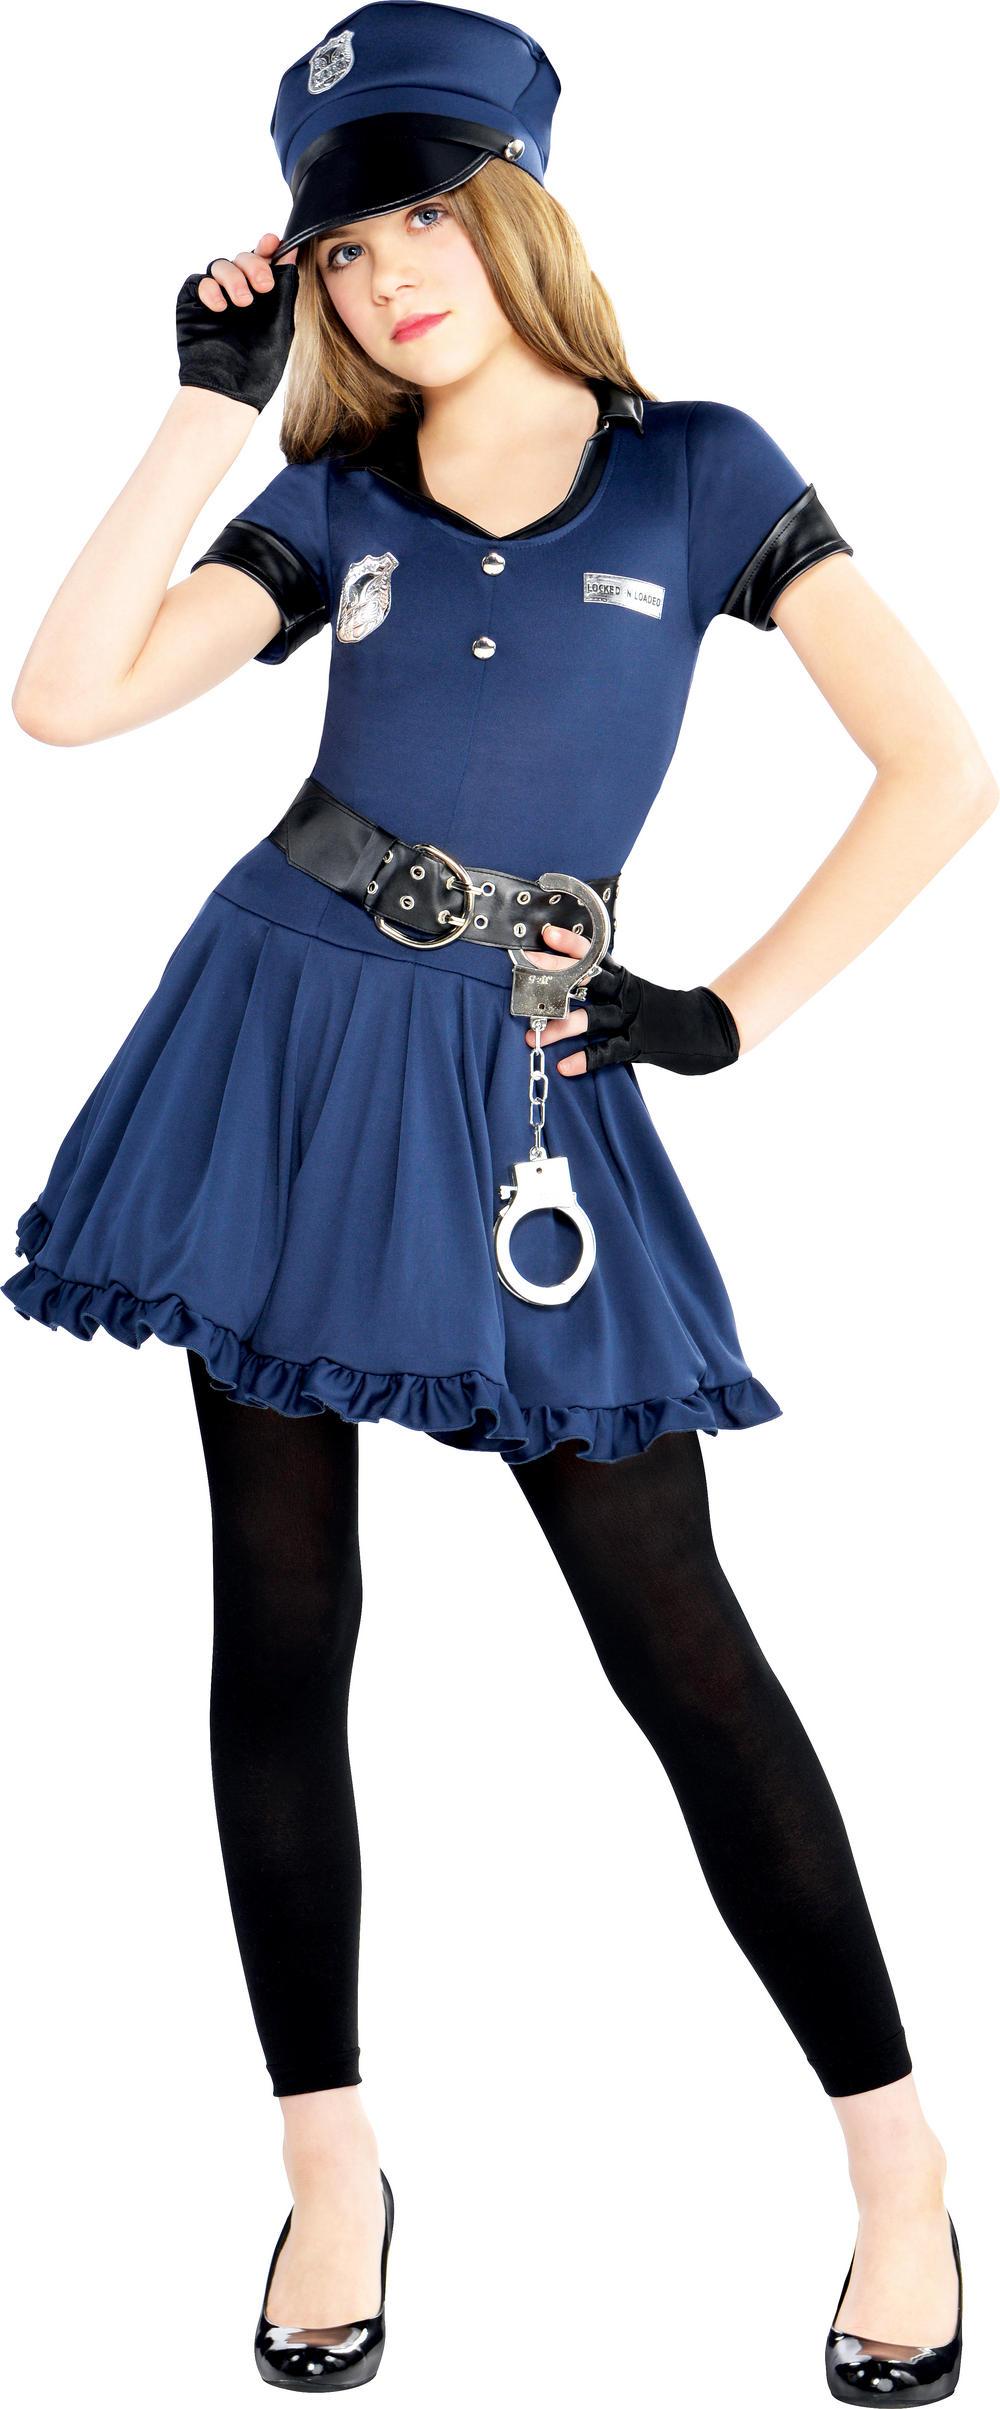 Cop Cutie Costume